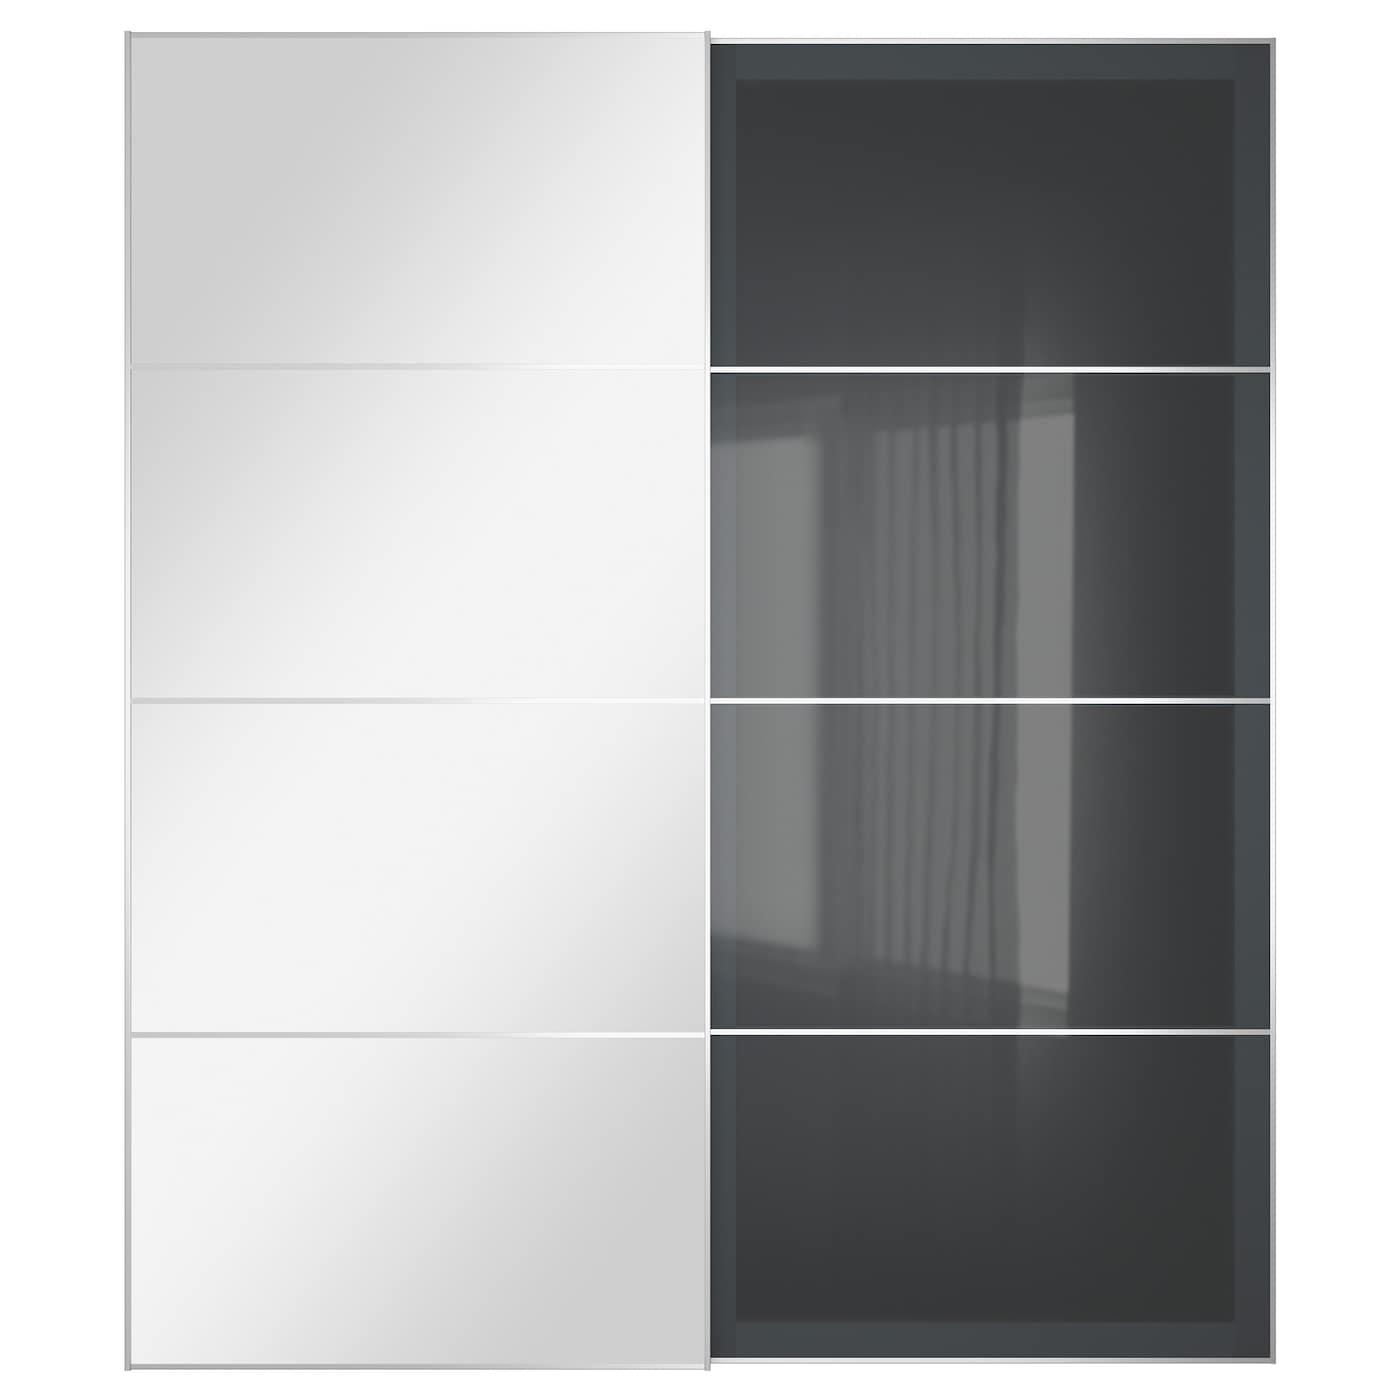 portes coulissantes pax ikea. Black Bedroom Furniture Sets. Home Design Ideas